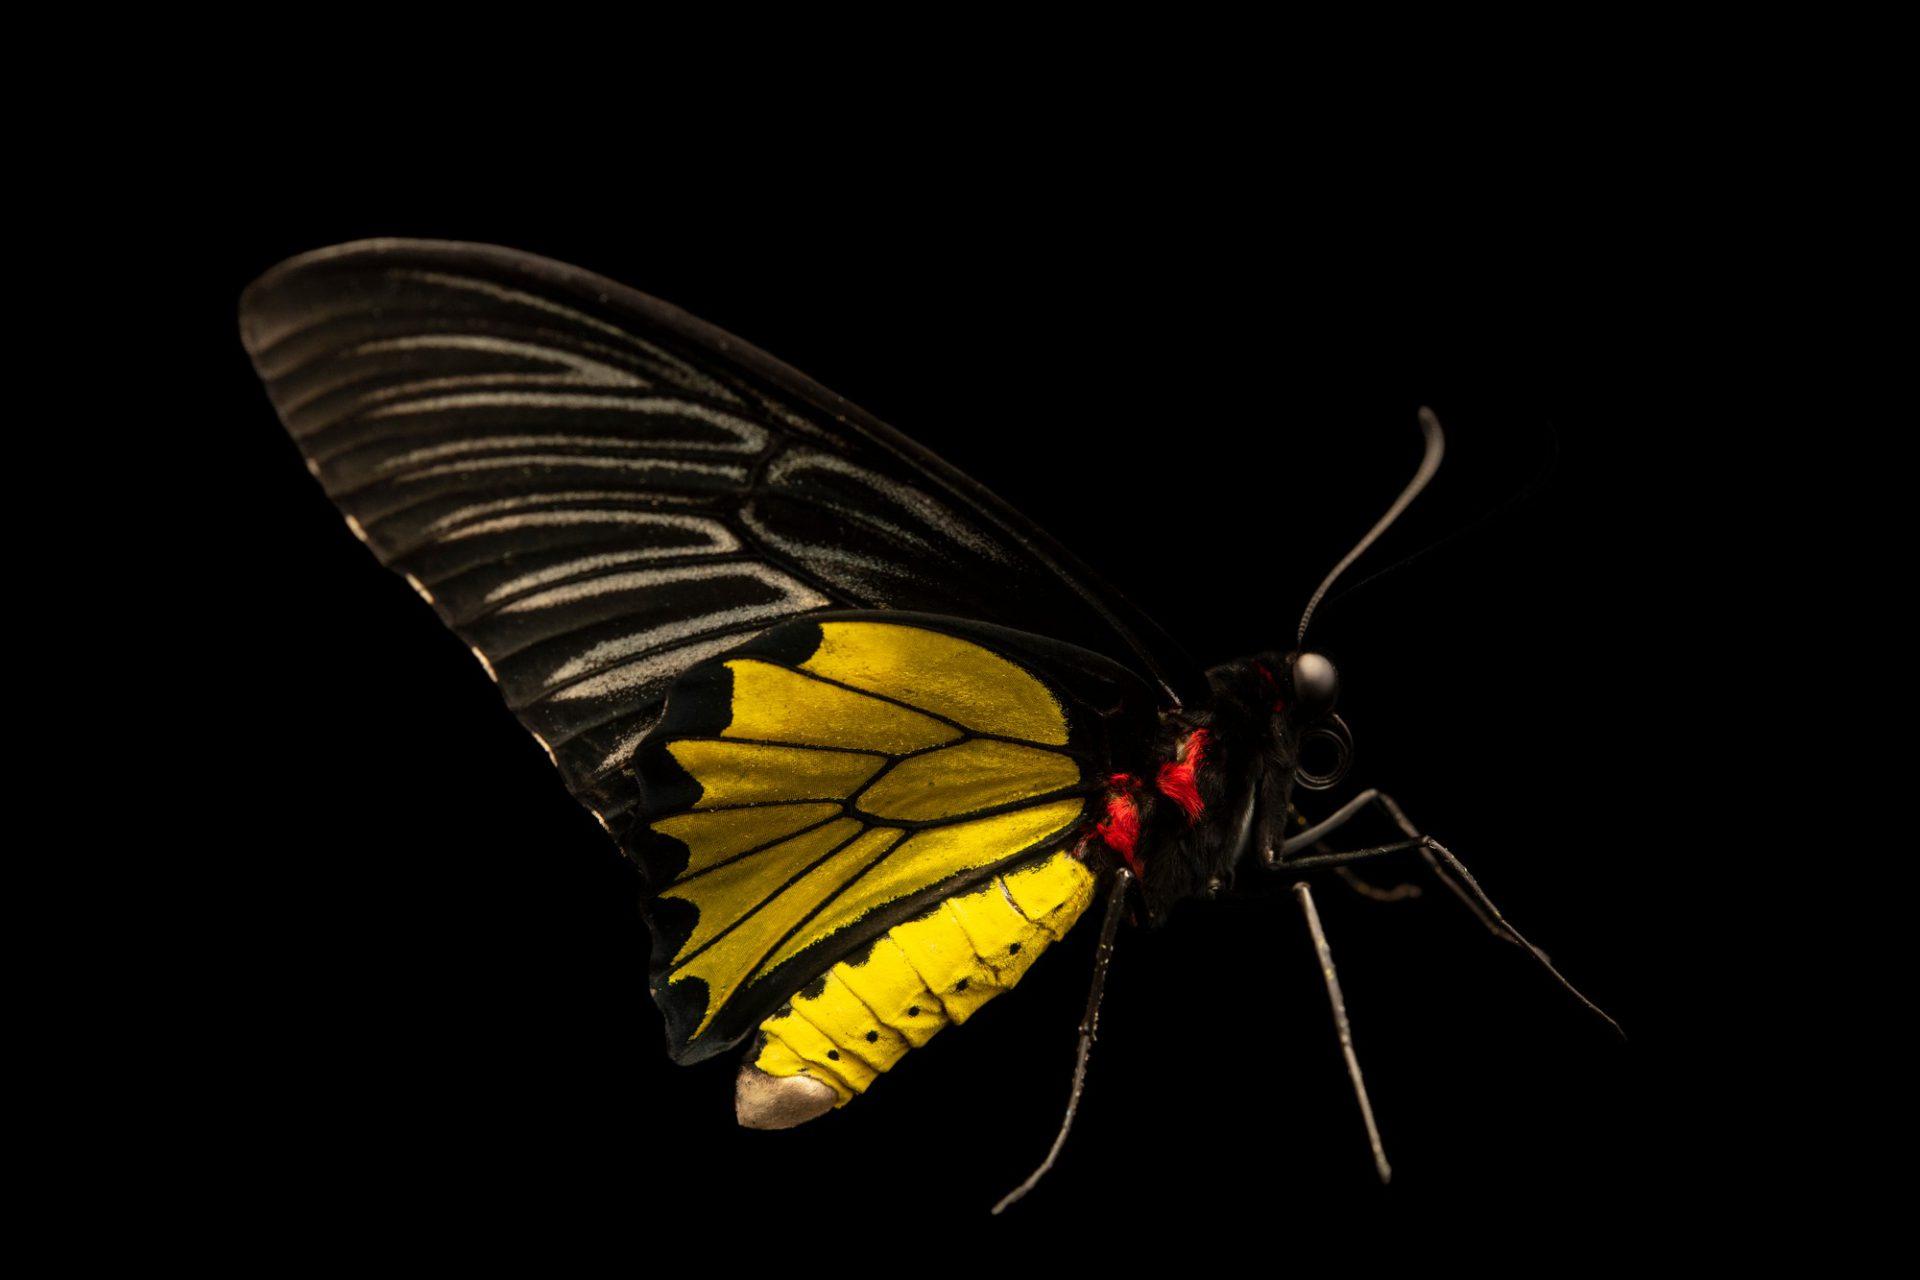 Photo: Golden birdwing, (Troides radamanthus radamanthus), at Crocolandia in the Philippines.